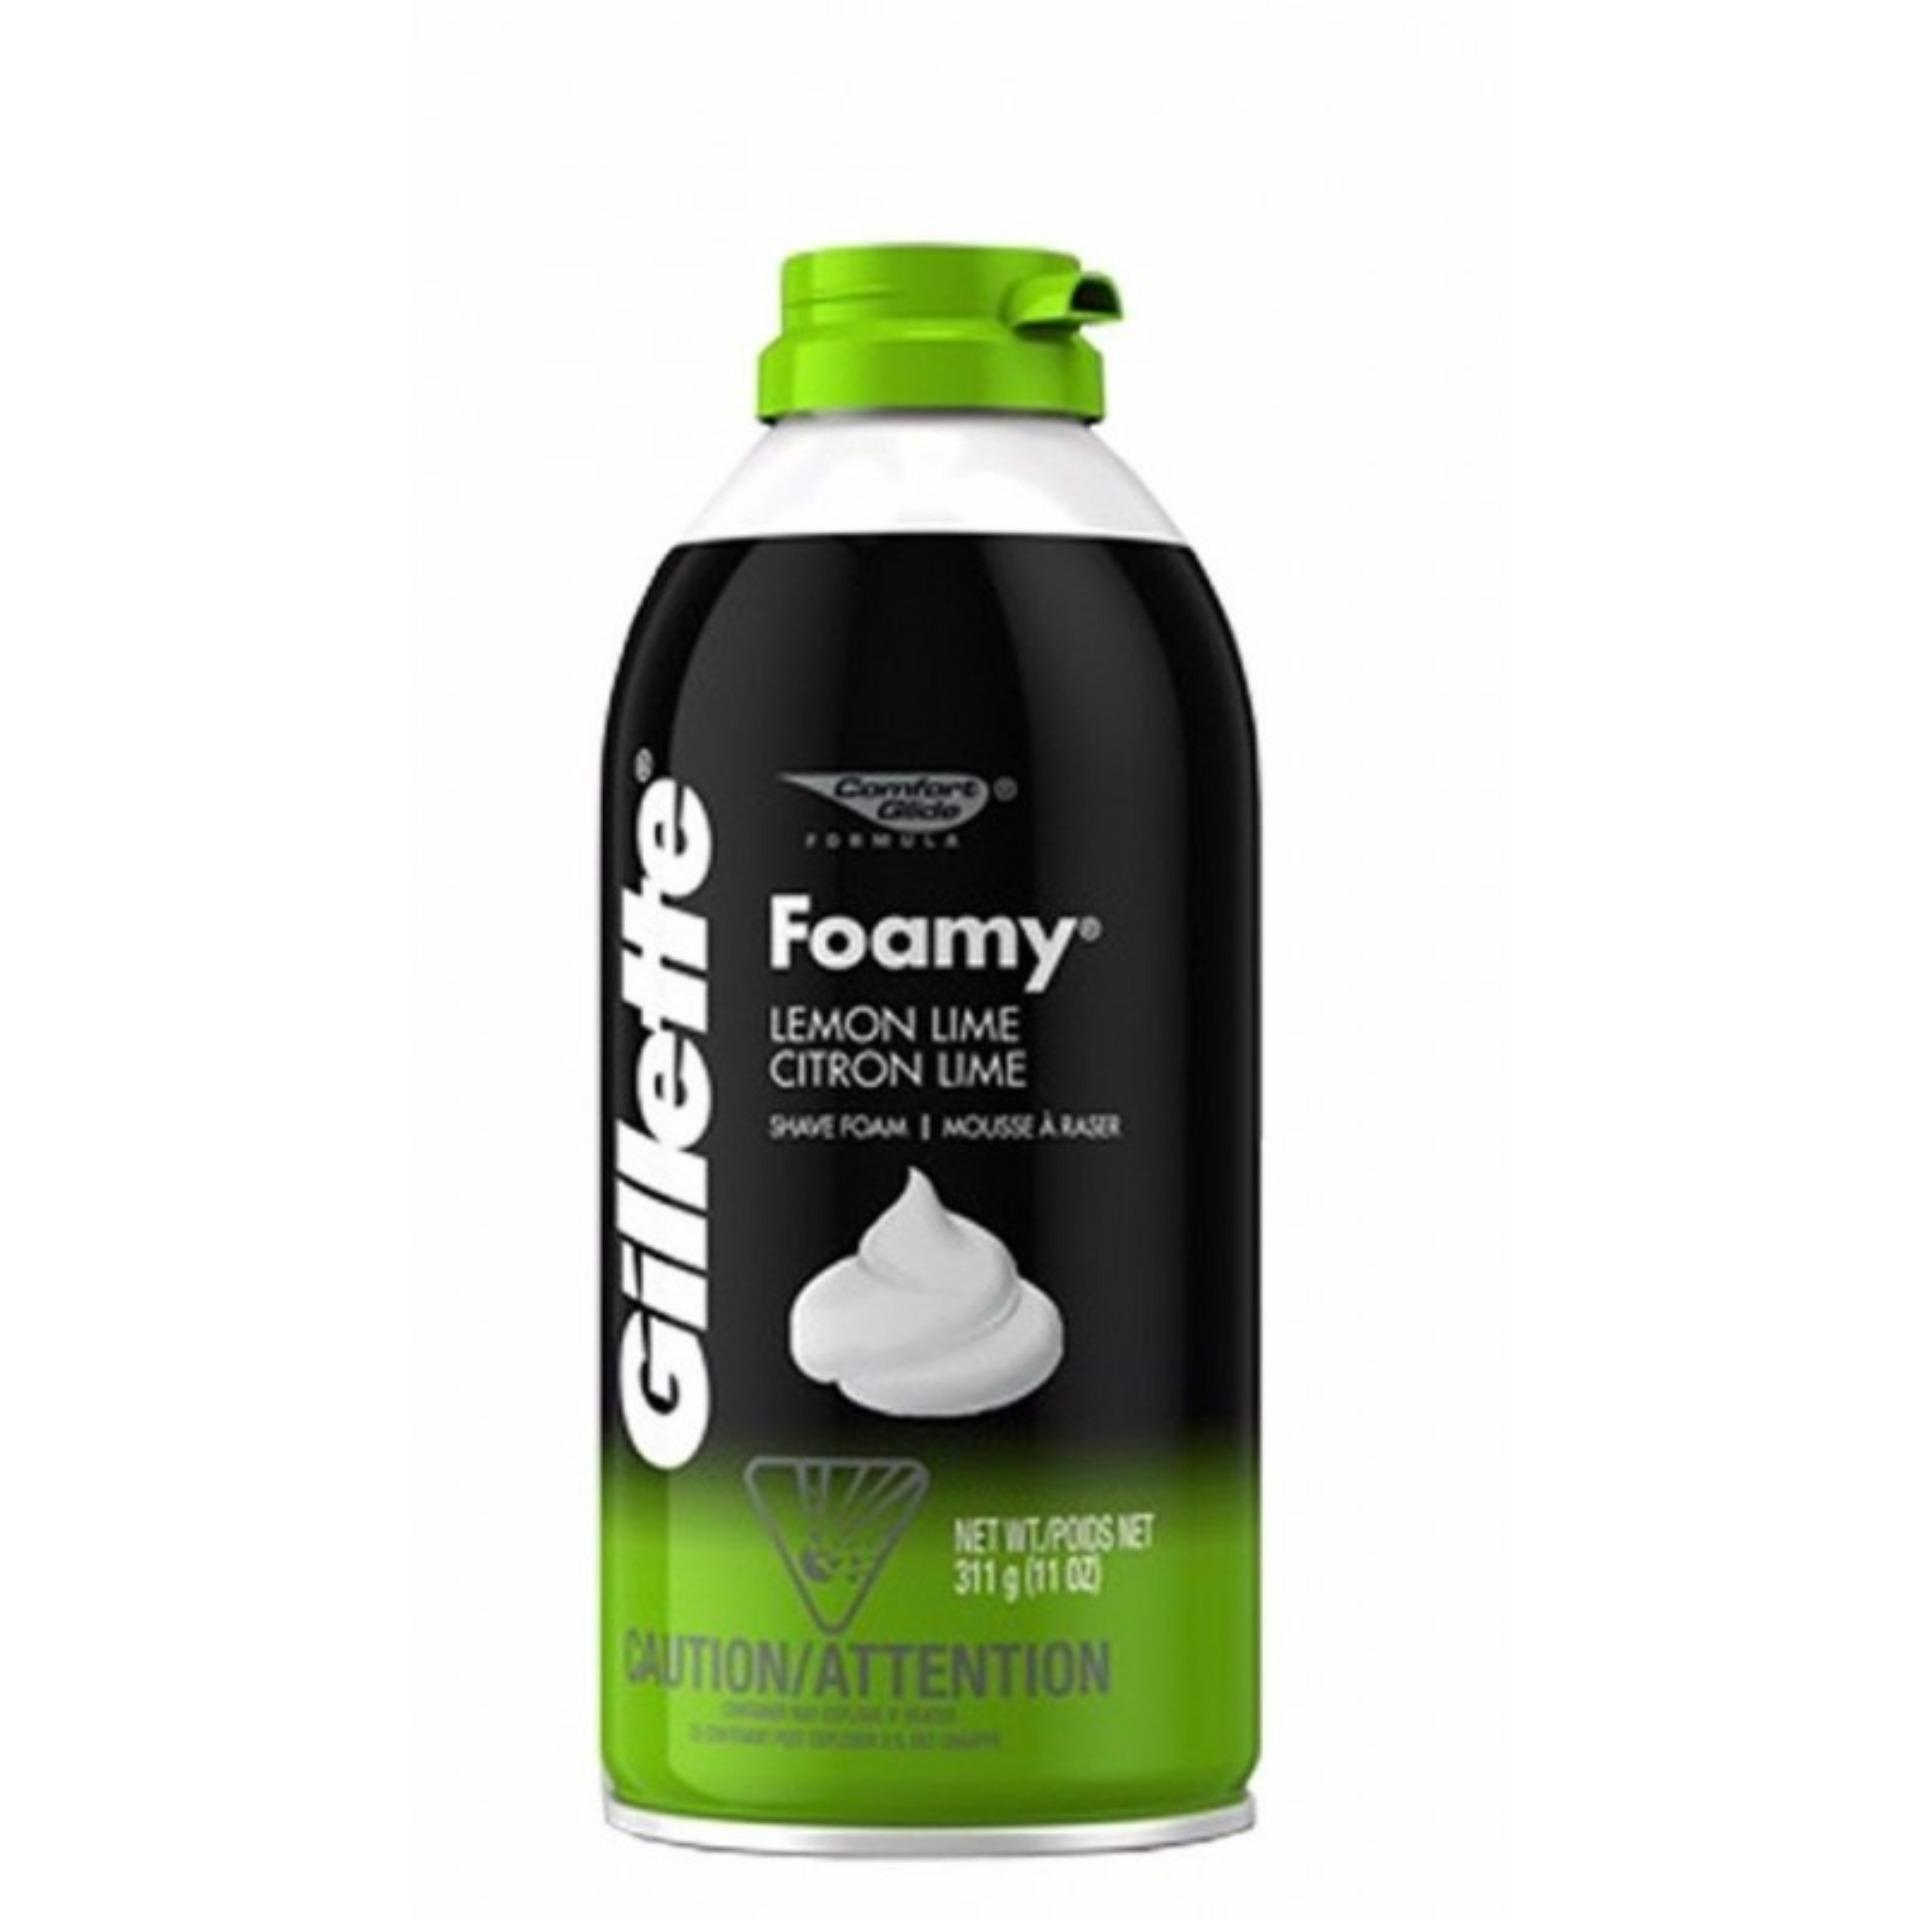 Kem bọt cạo râu Gillette Foamy Lemon Lime Citron 311g (Xanh) tốt nhất